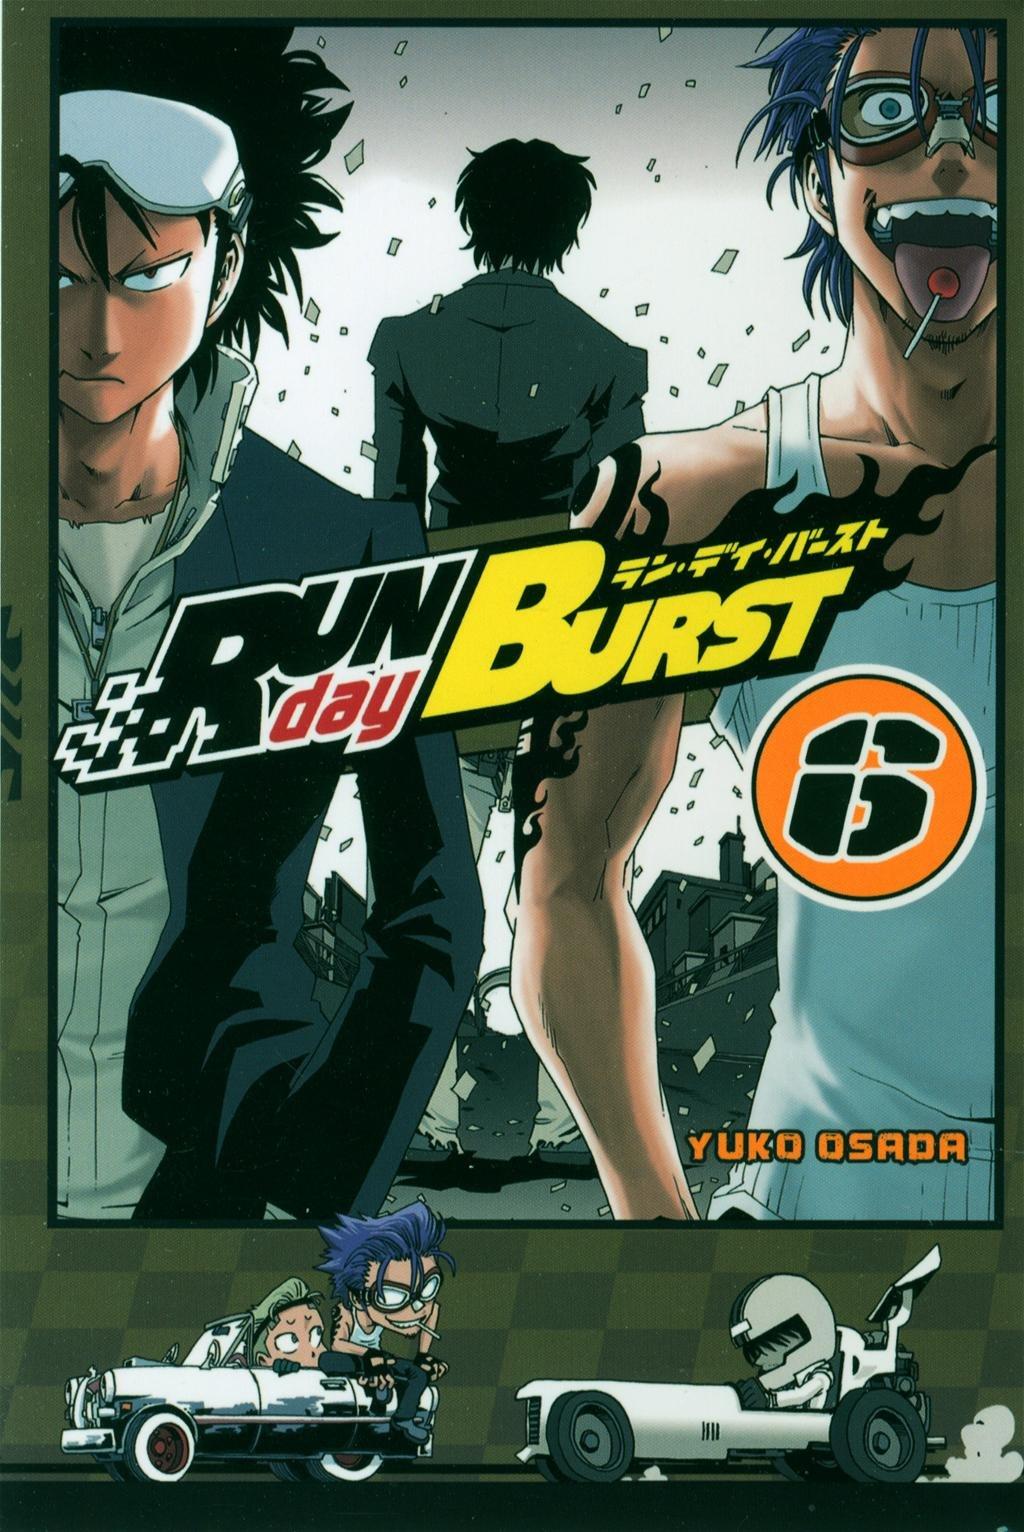 Run day Burst Vol.6 Poche – 22 mars 2012 OSADA Yûkô Ki-oon 235592371X Comics & mangas